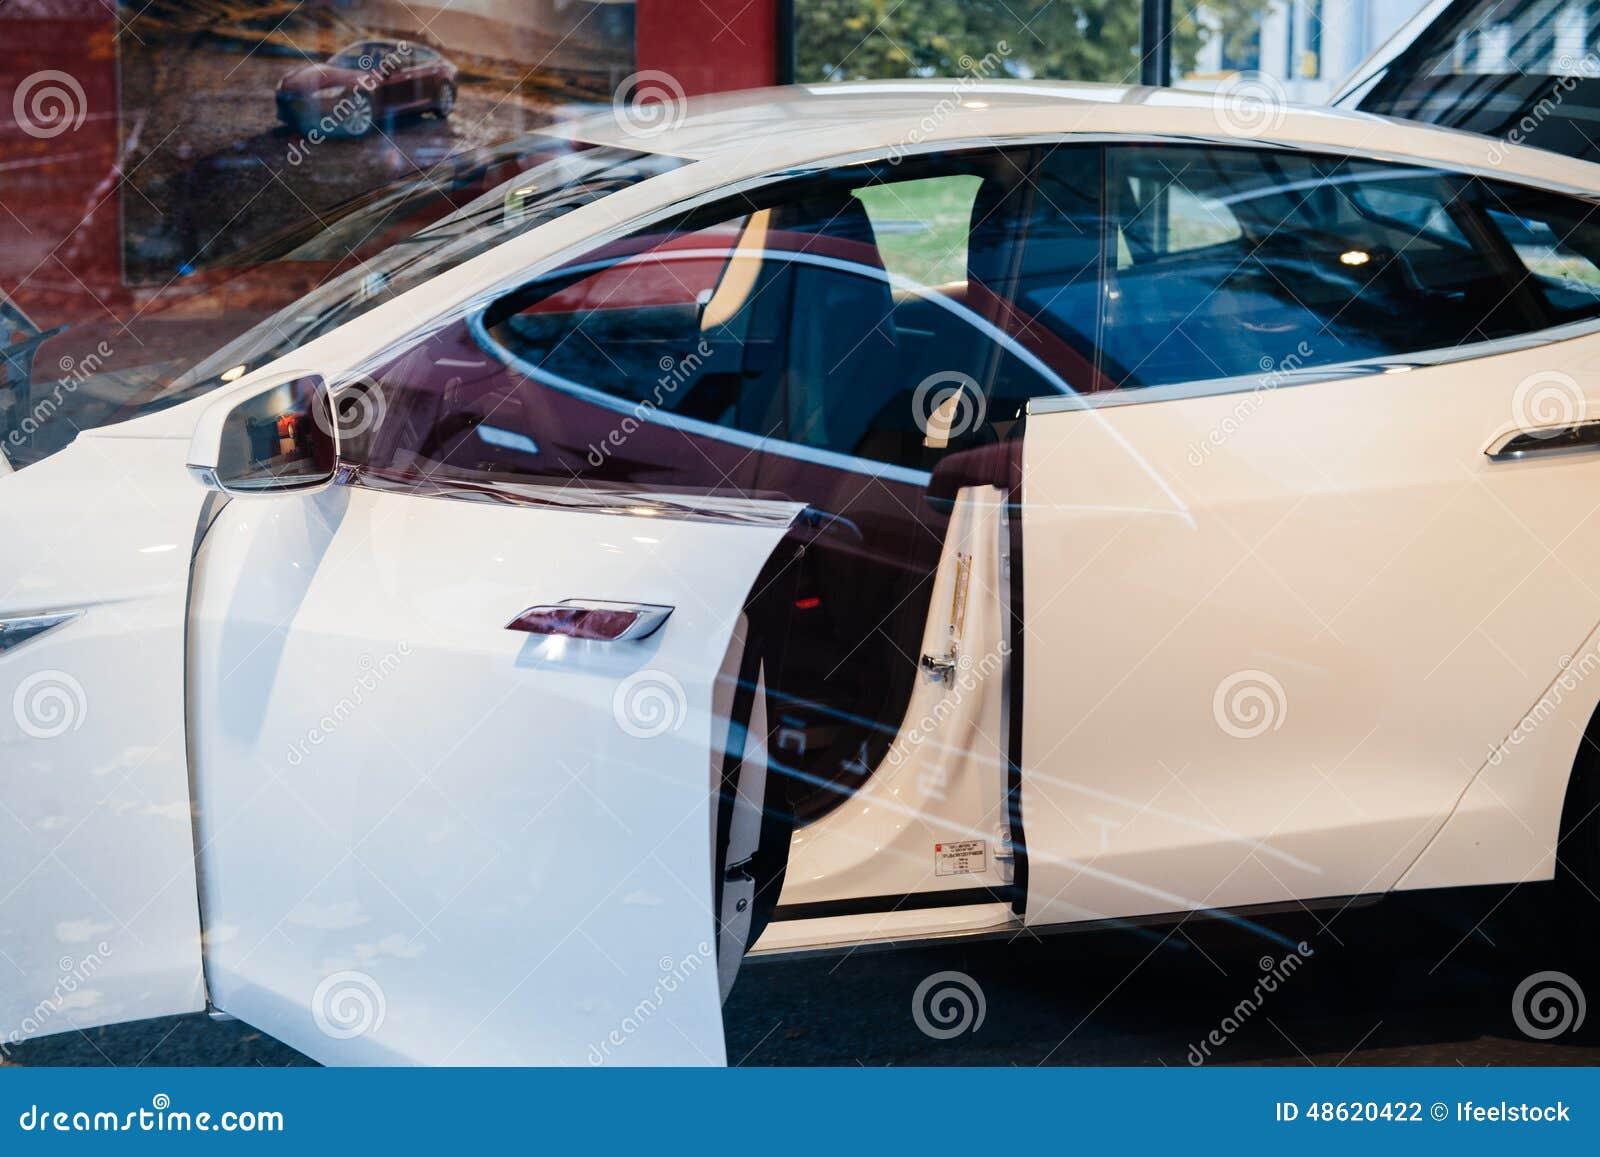 tesla model s electric car zero emissions editorial photography image 48620422. Black Bedroom Furniture Sets. Home Design Ideas